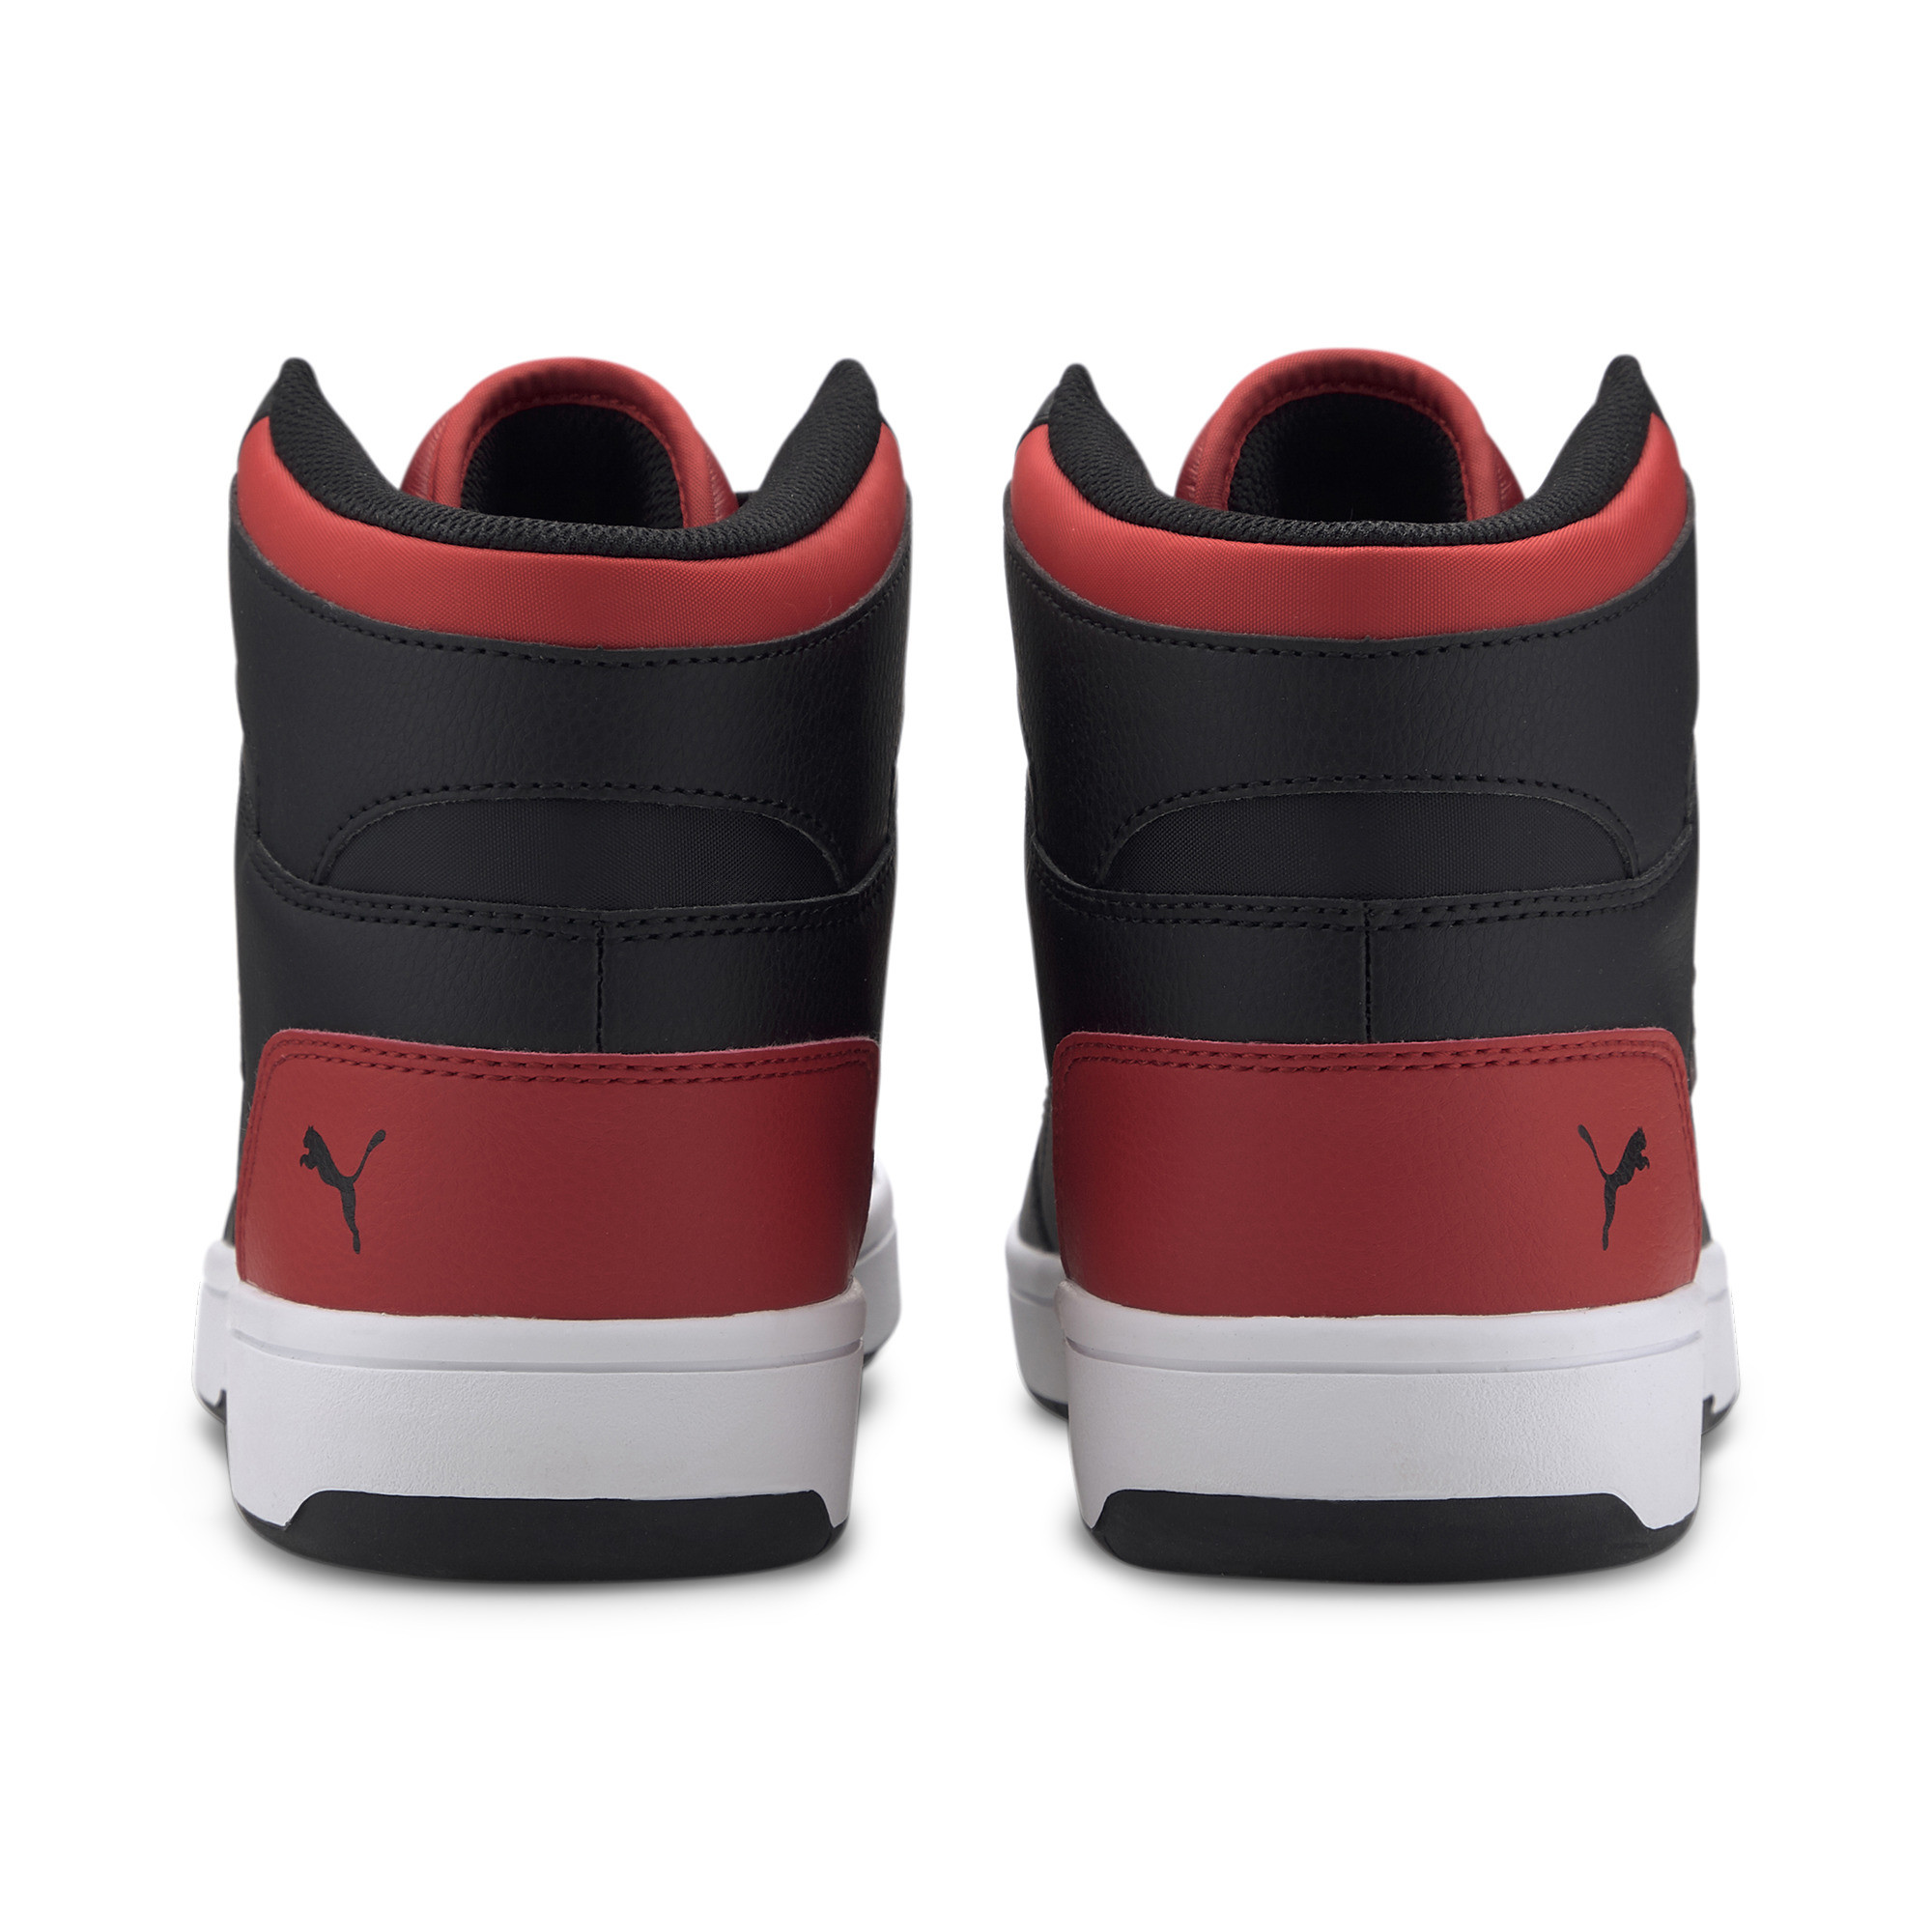 PUMA-PUMA-Rebound-LayUp-Men-039-s-Sneakers-Men-Mid-Boot-Basics thumbnail 15